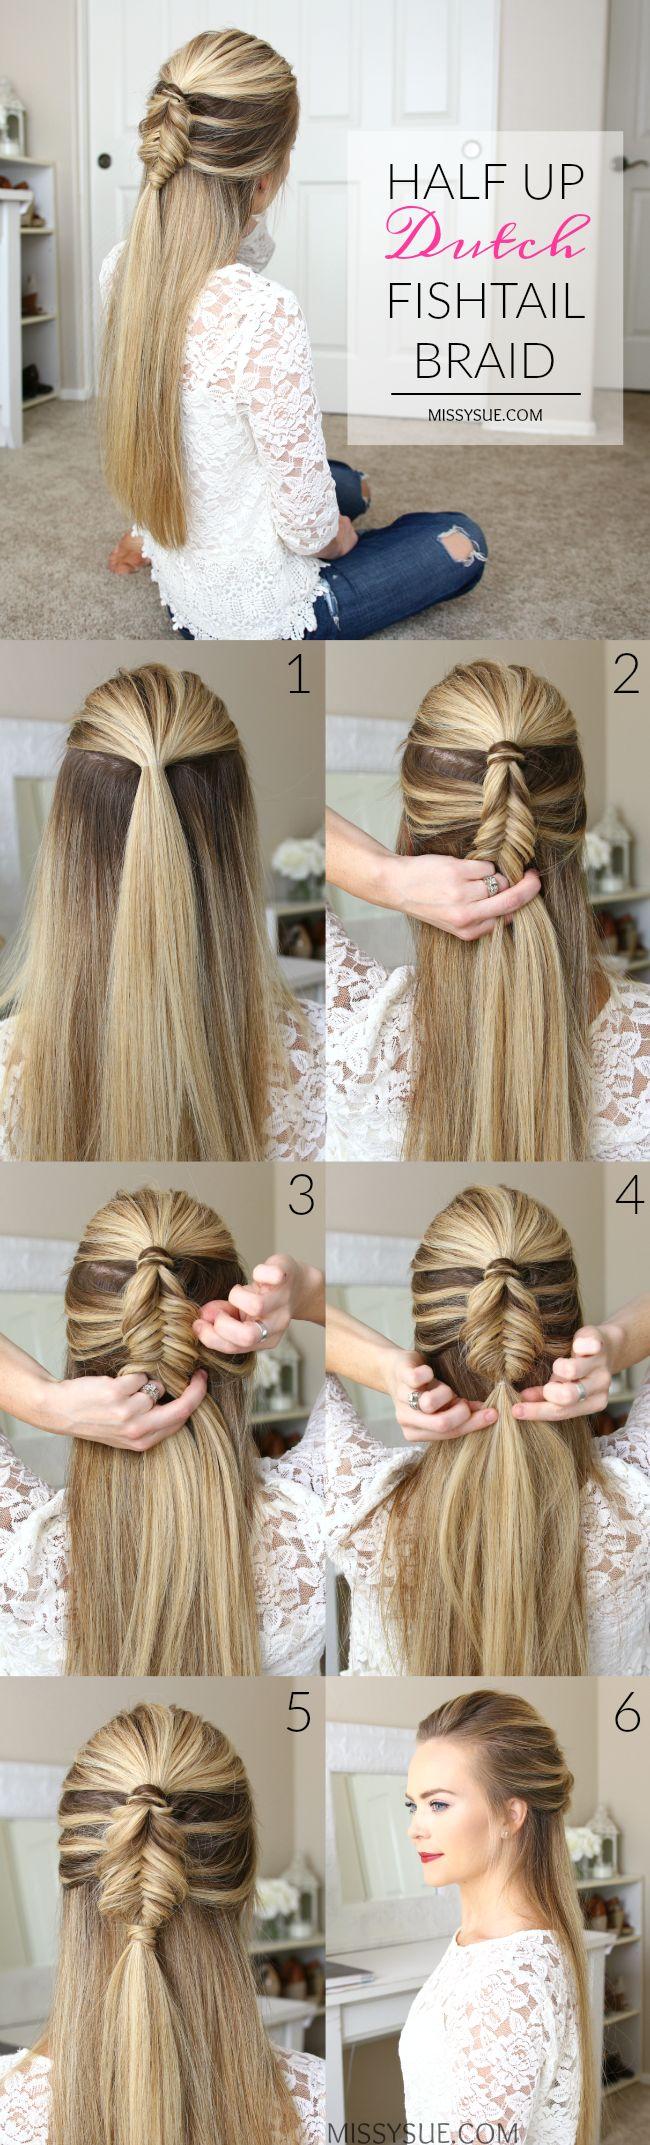 medio-up-holandés-cola de pez-trenza-peinado-tutorial #braidedhairstyles